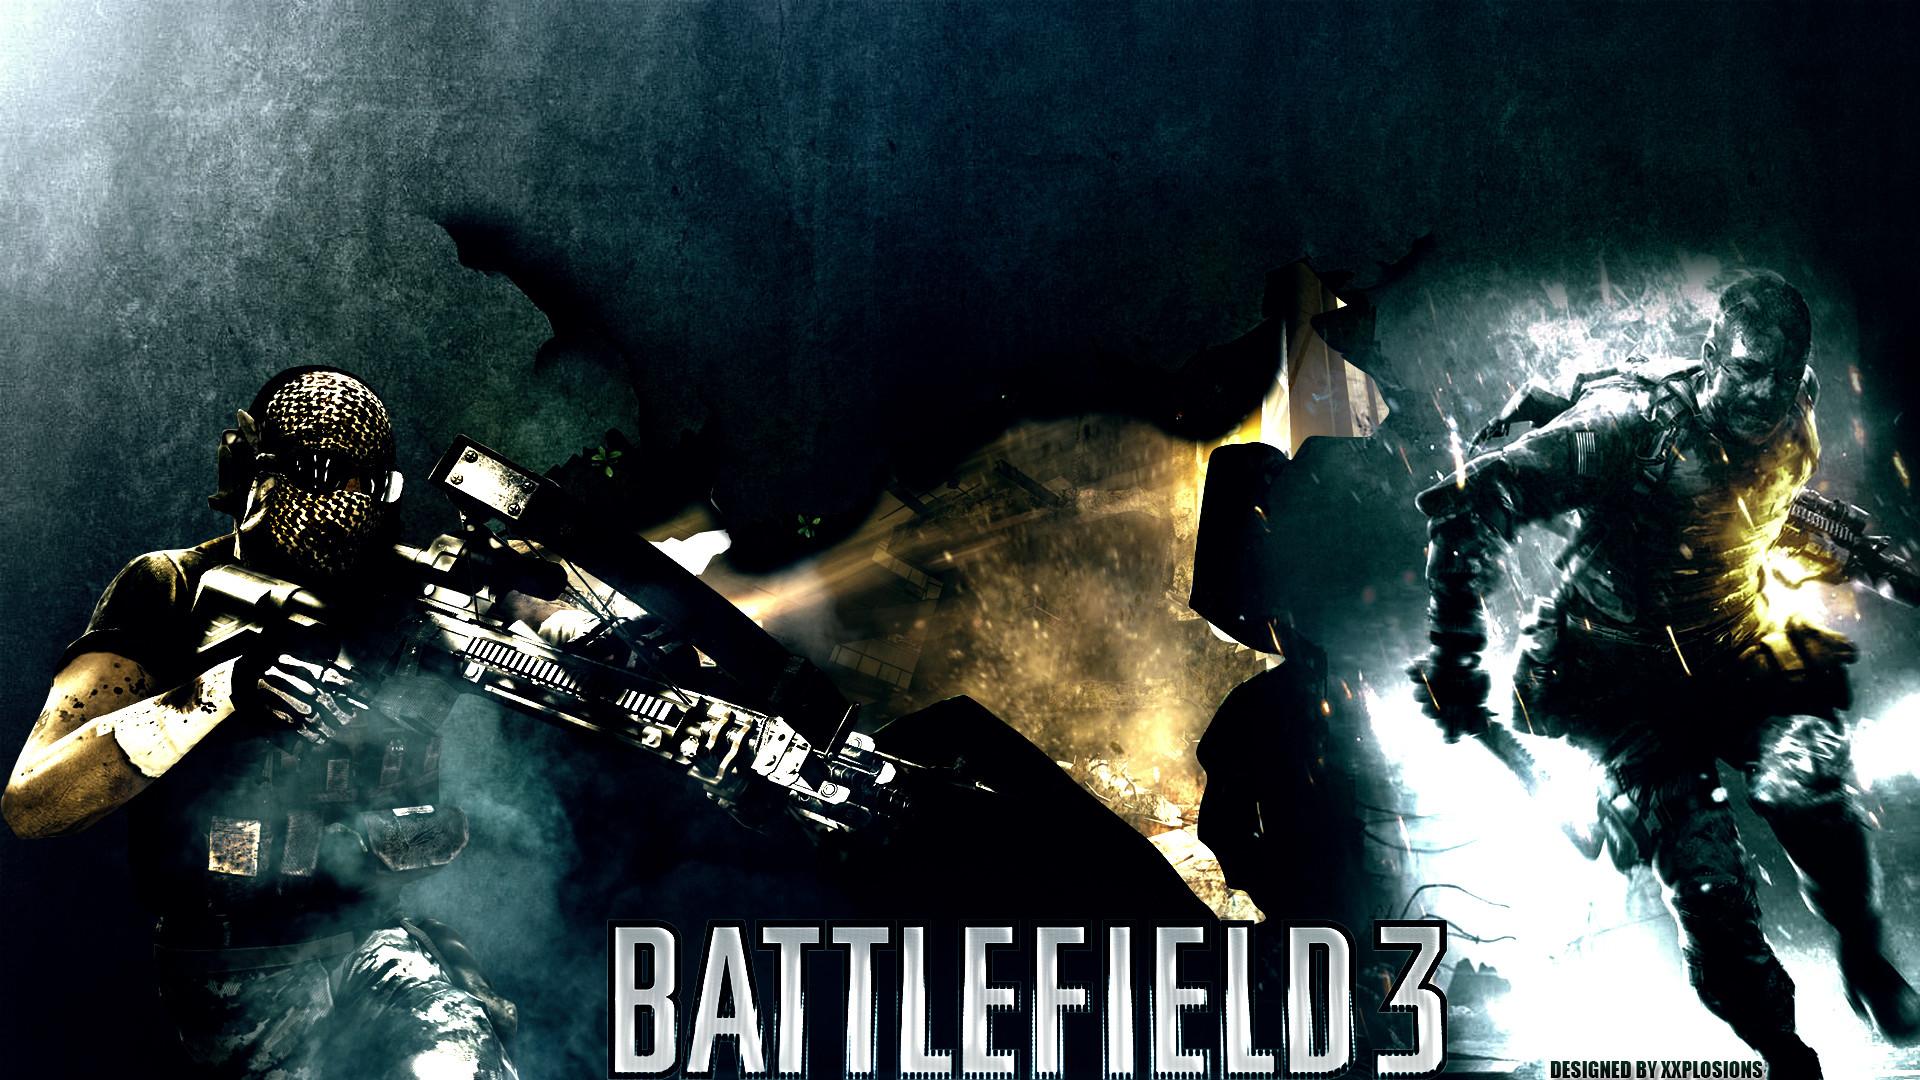 Res: 1920x1080, ... Only In Battlefield 3 | BF3 Desktop Wallpaper by Xxplosions